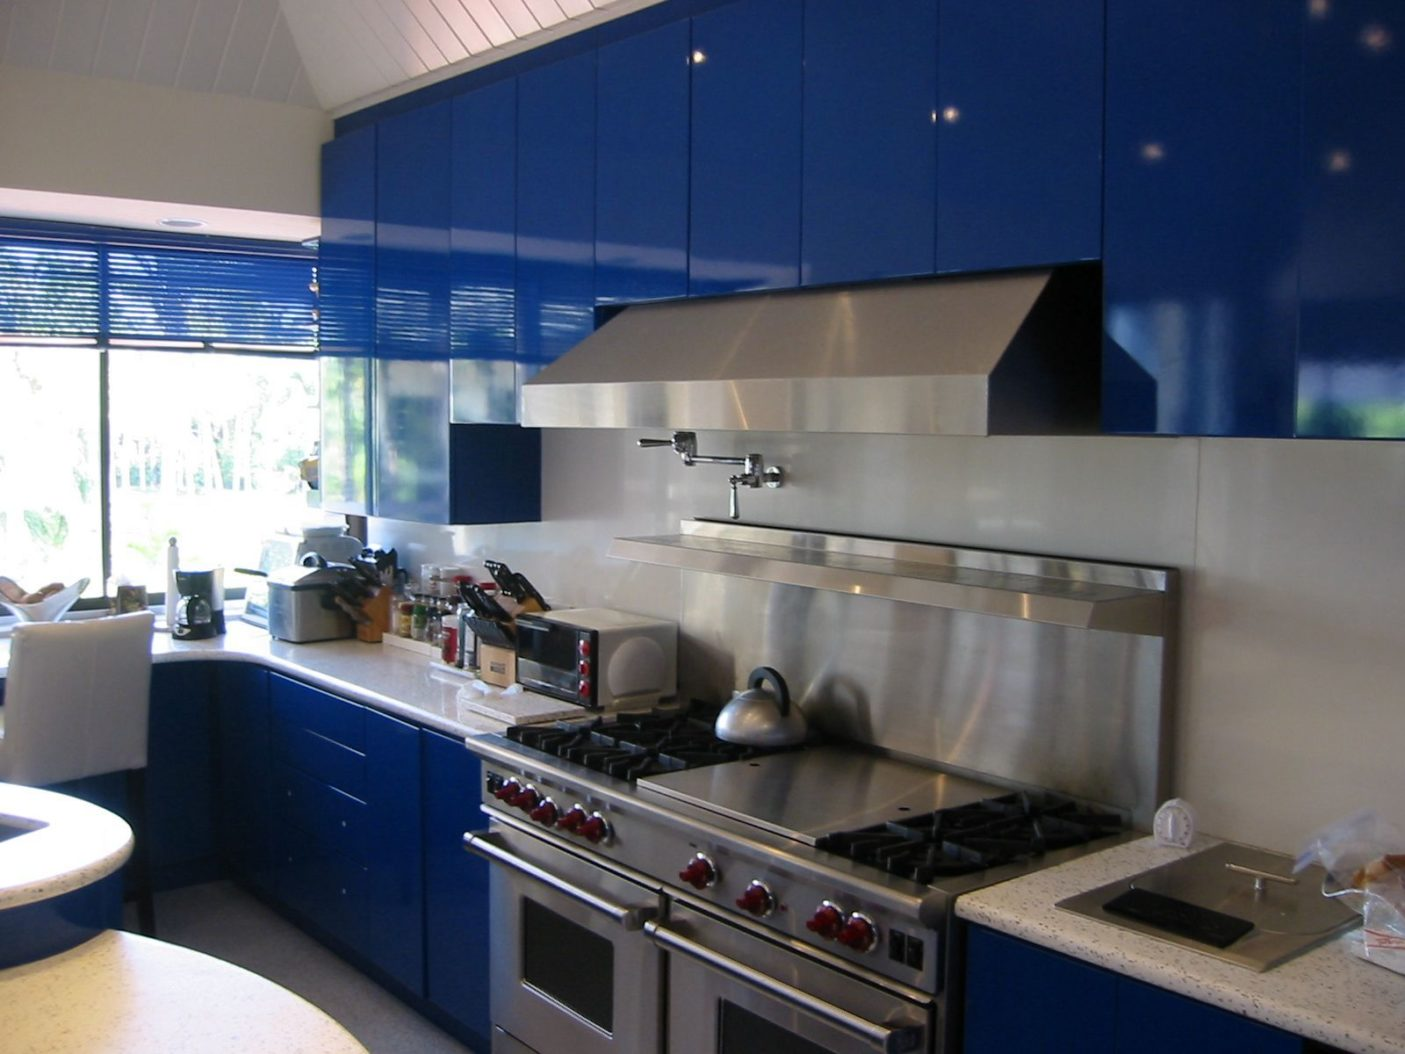 Kitchens-138.jpg